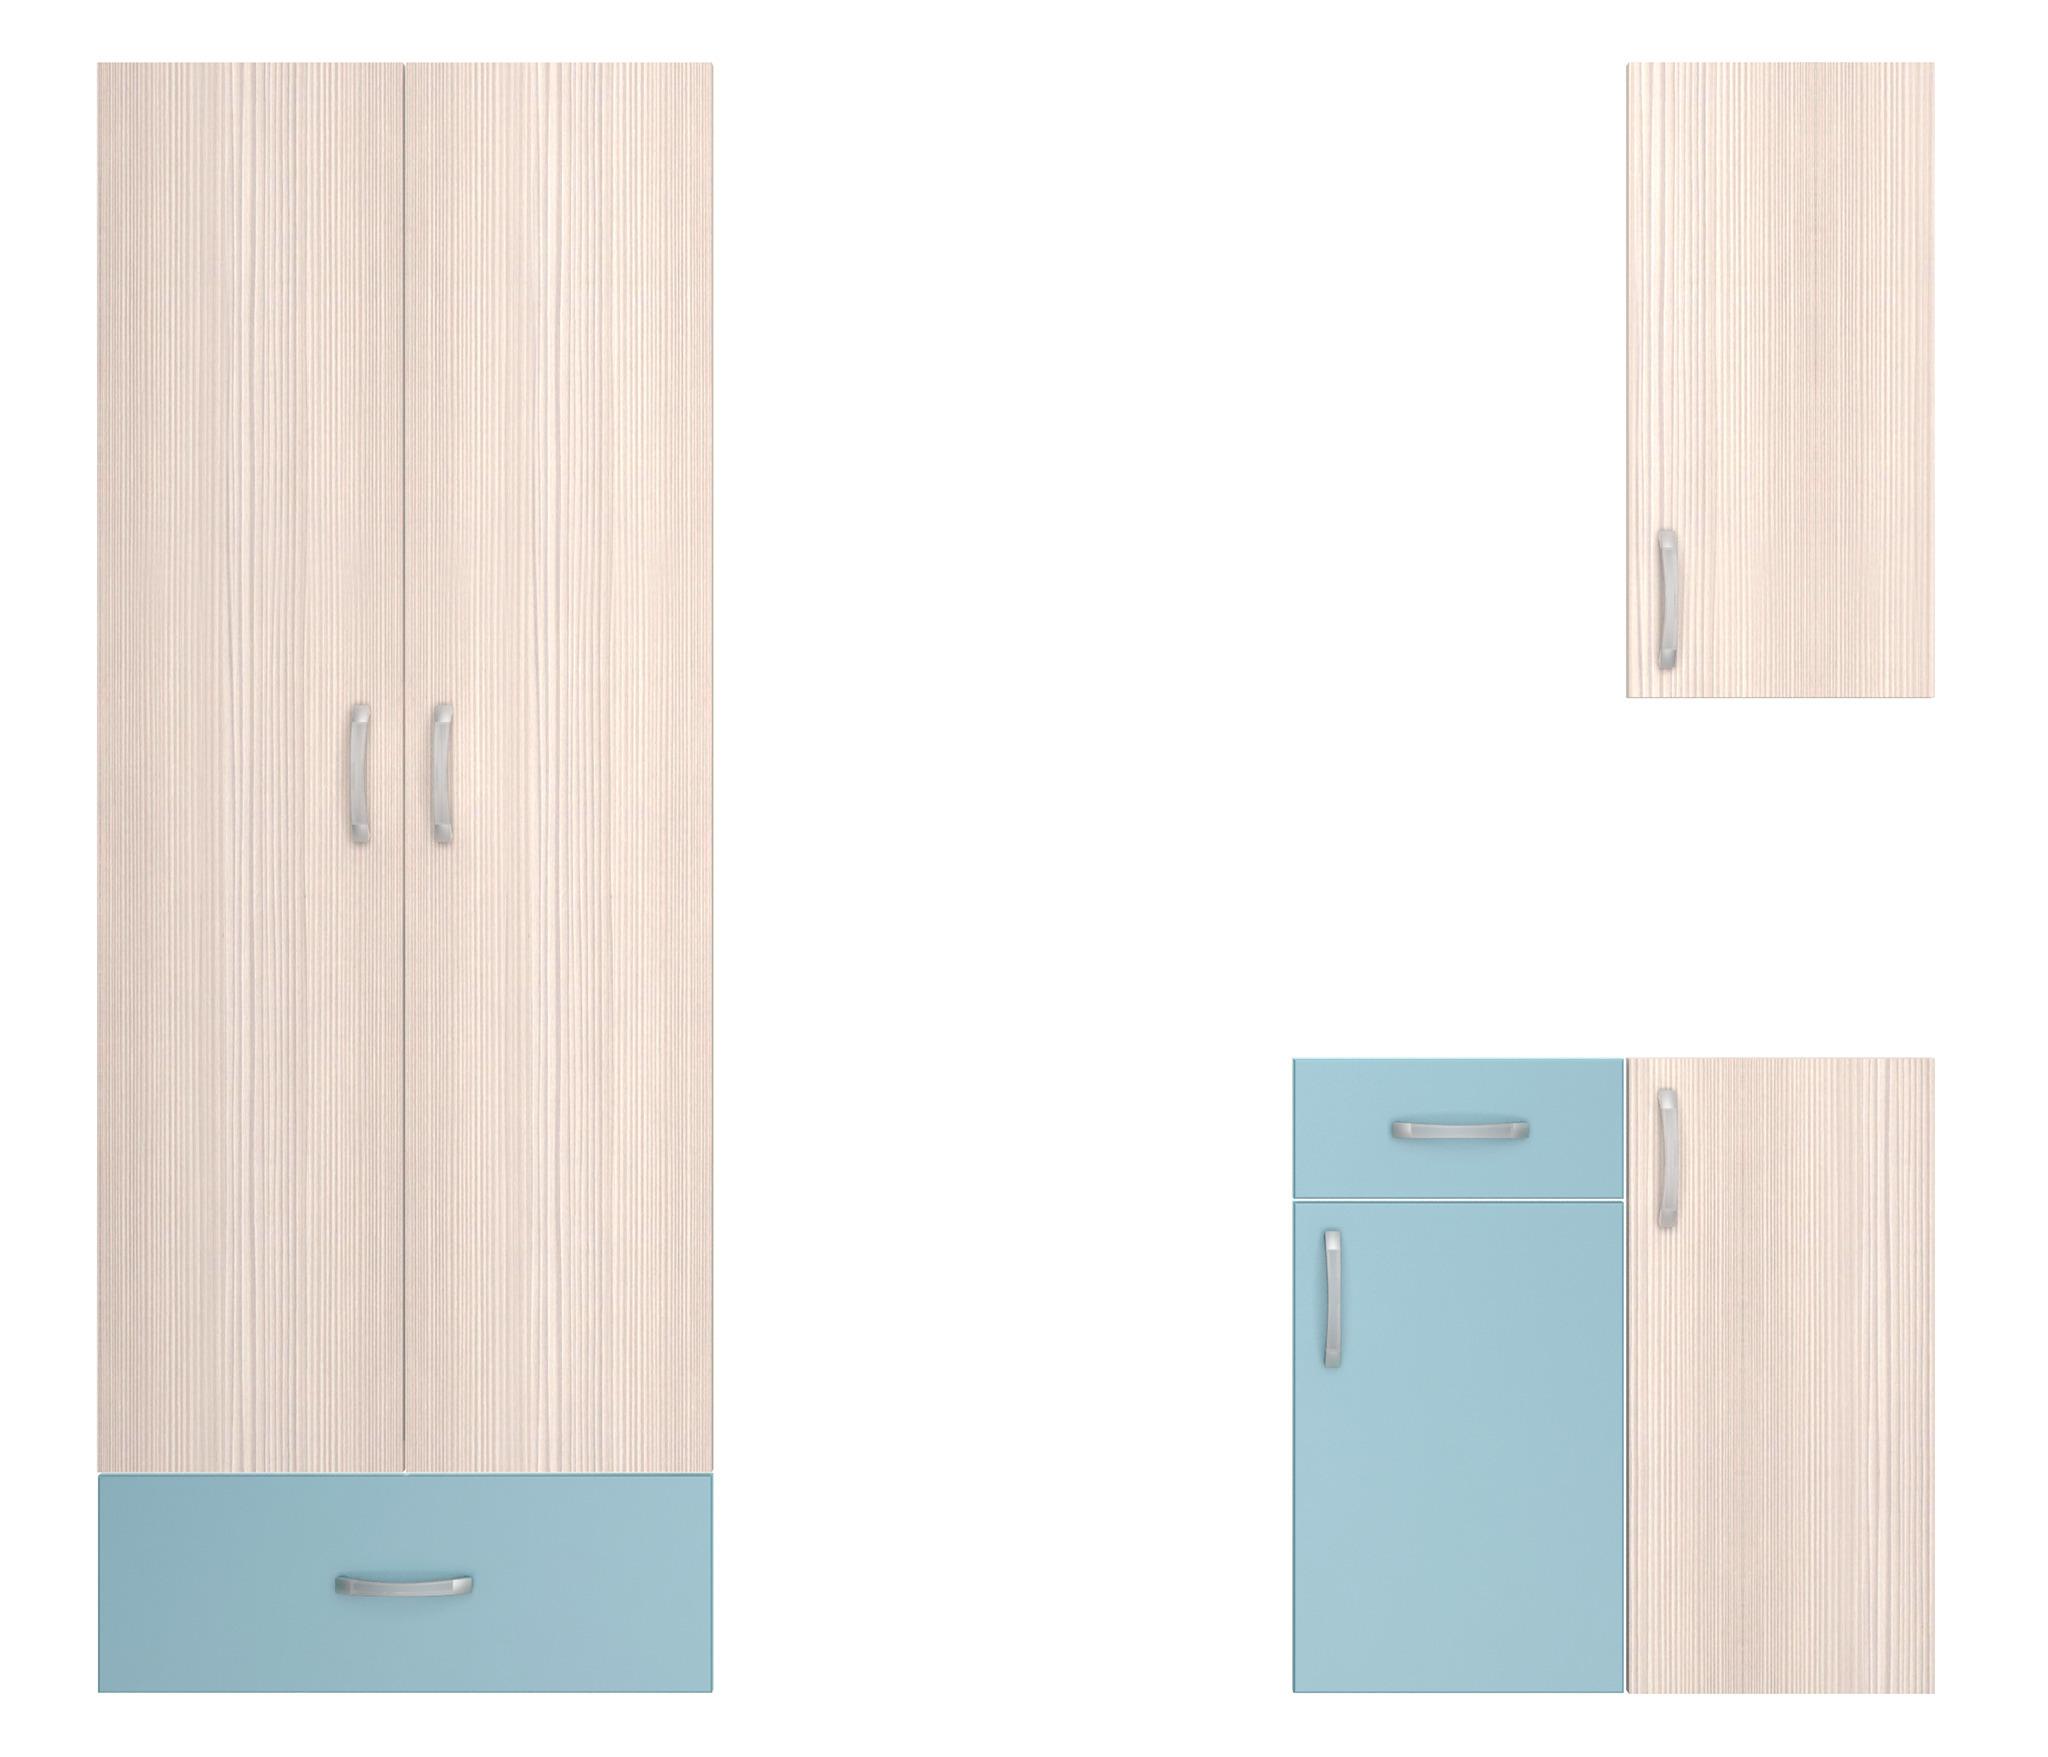 Флауэ СТЛ.170.02М Комплект фасадовДетская<br><br><br>Длина мм: 0<br>Высота мм: 0<br>Глубина мм: 0